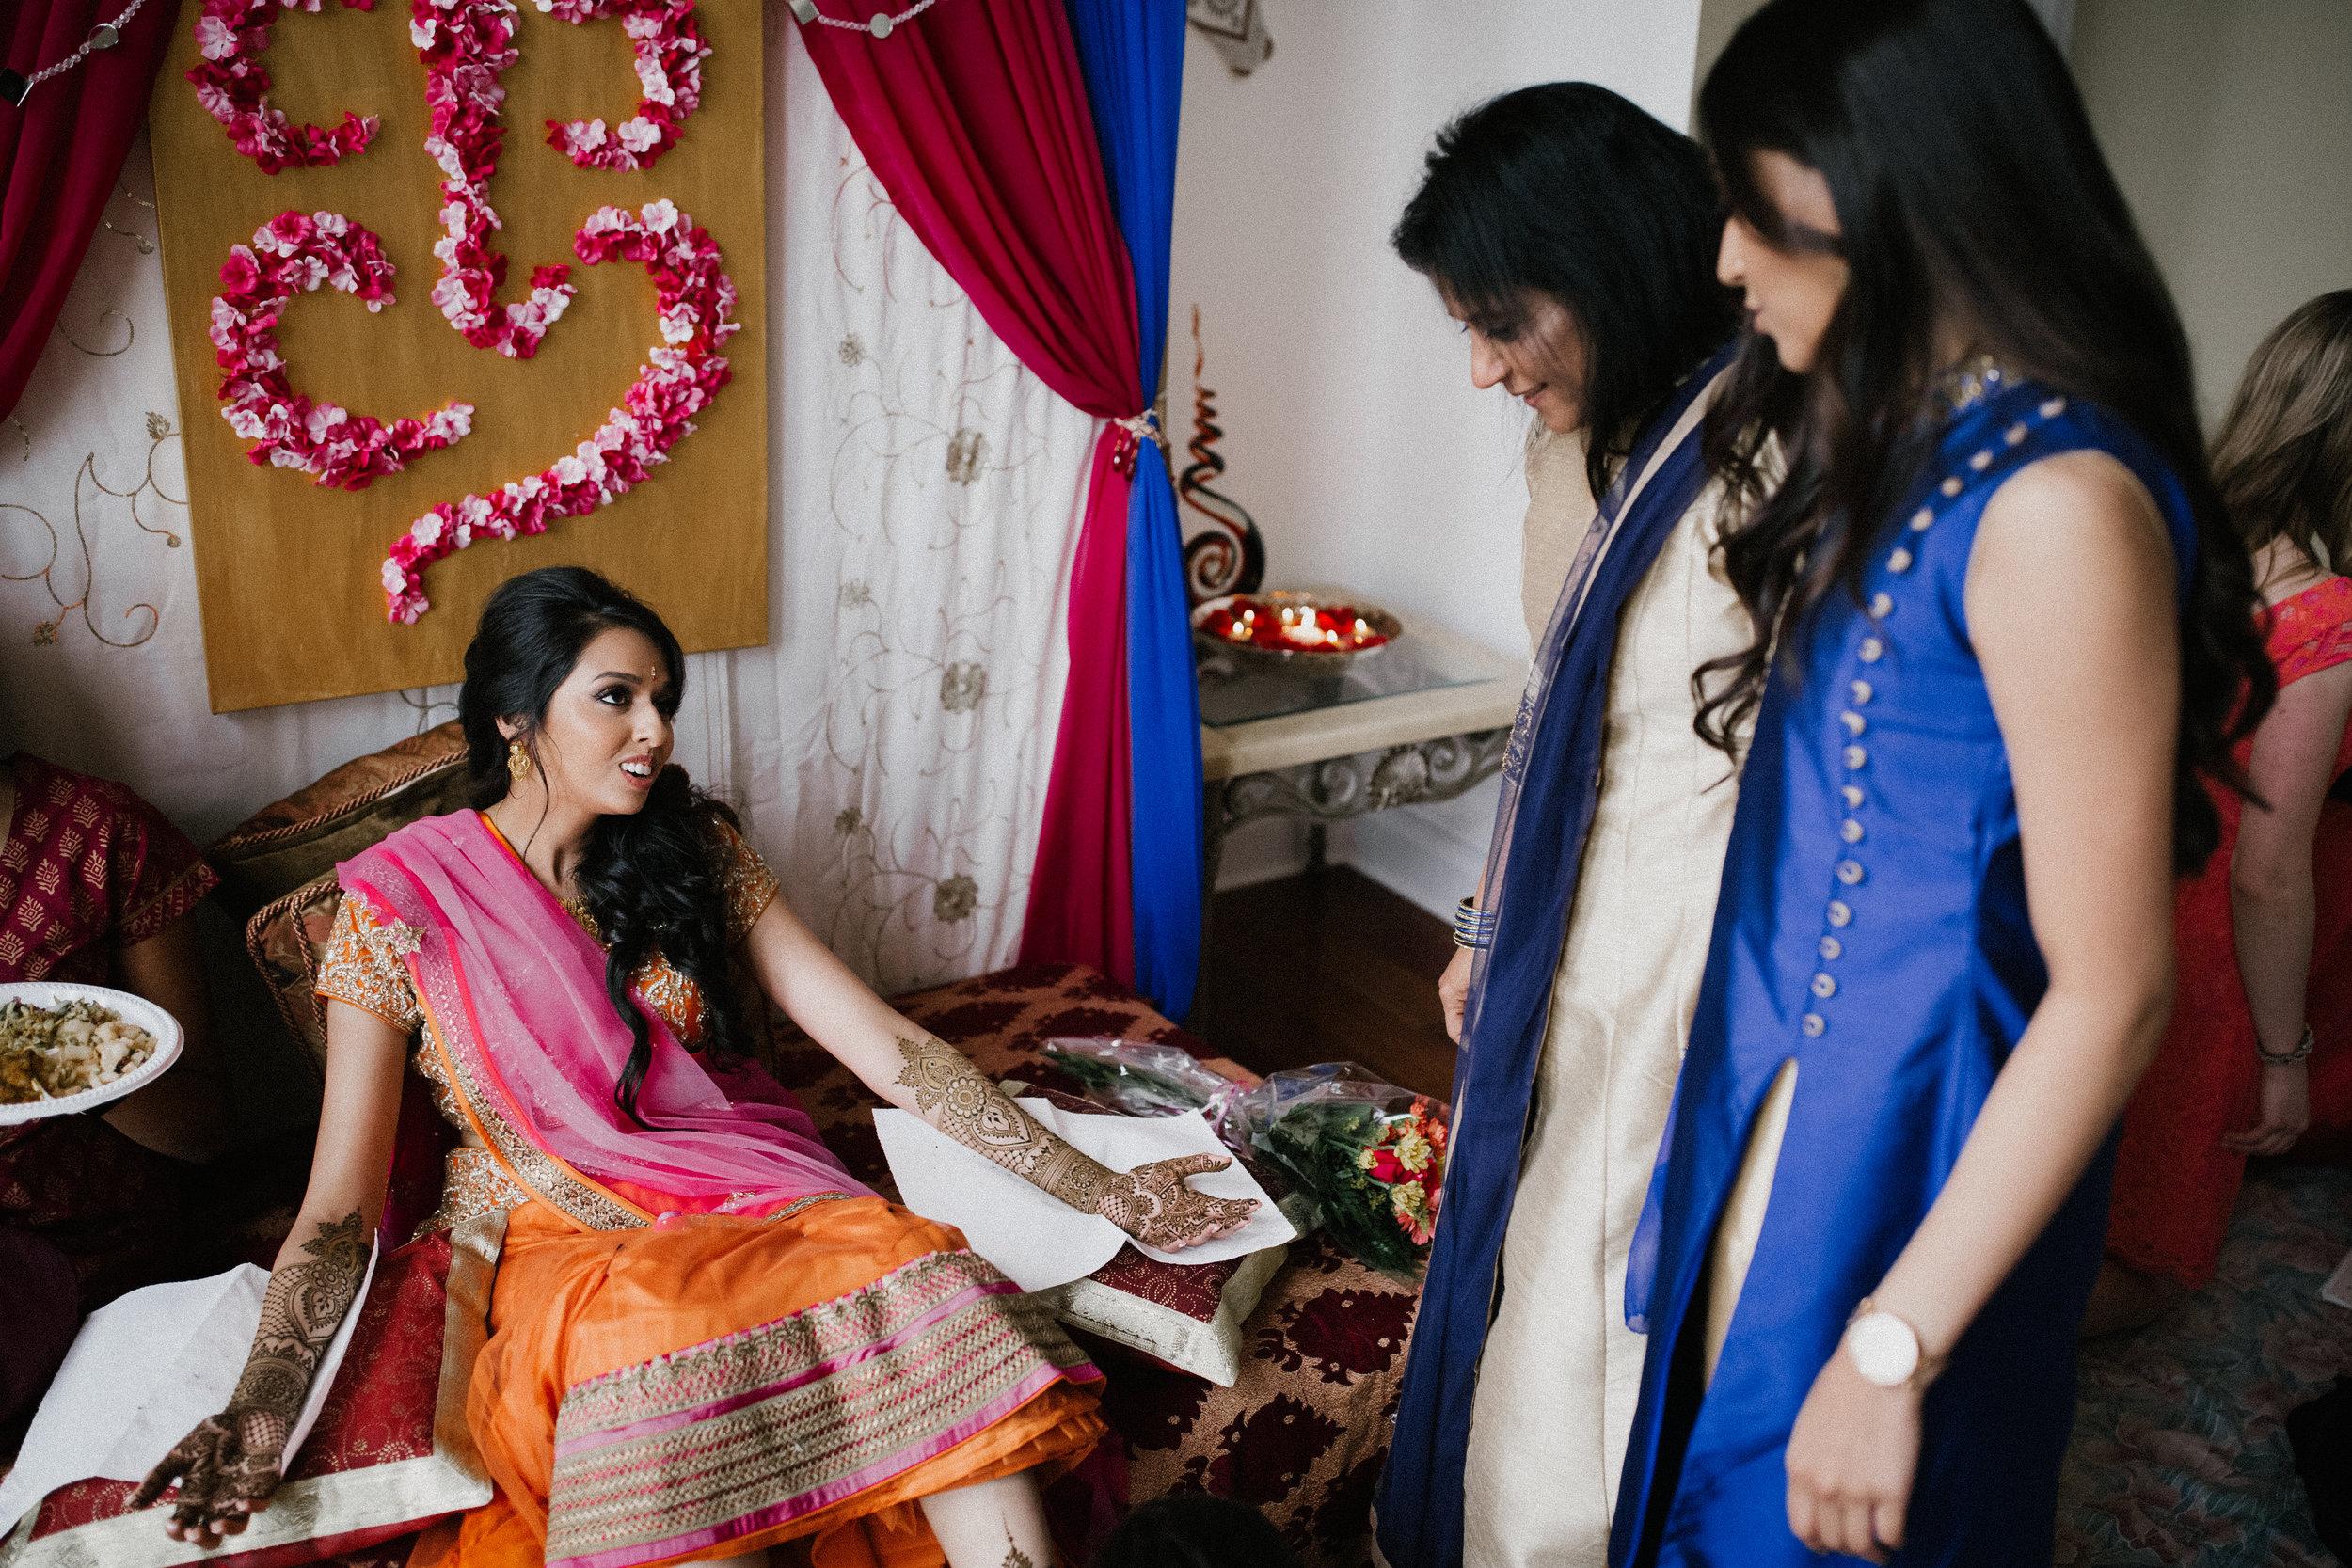 Aparna-Ankit-Patel-Mehndi-Wedding-Photos-0022.jpg